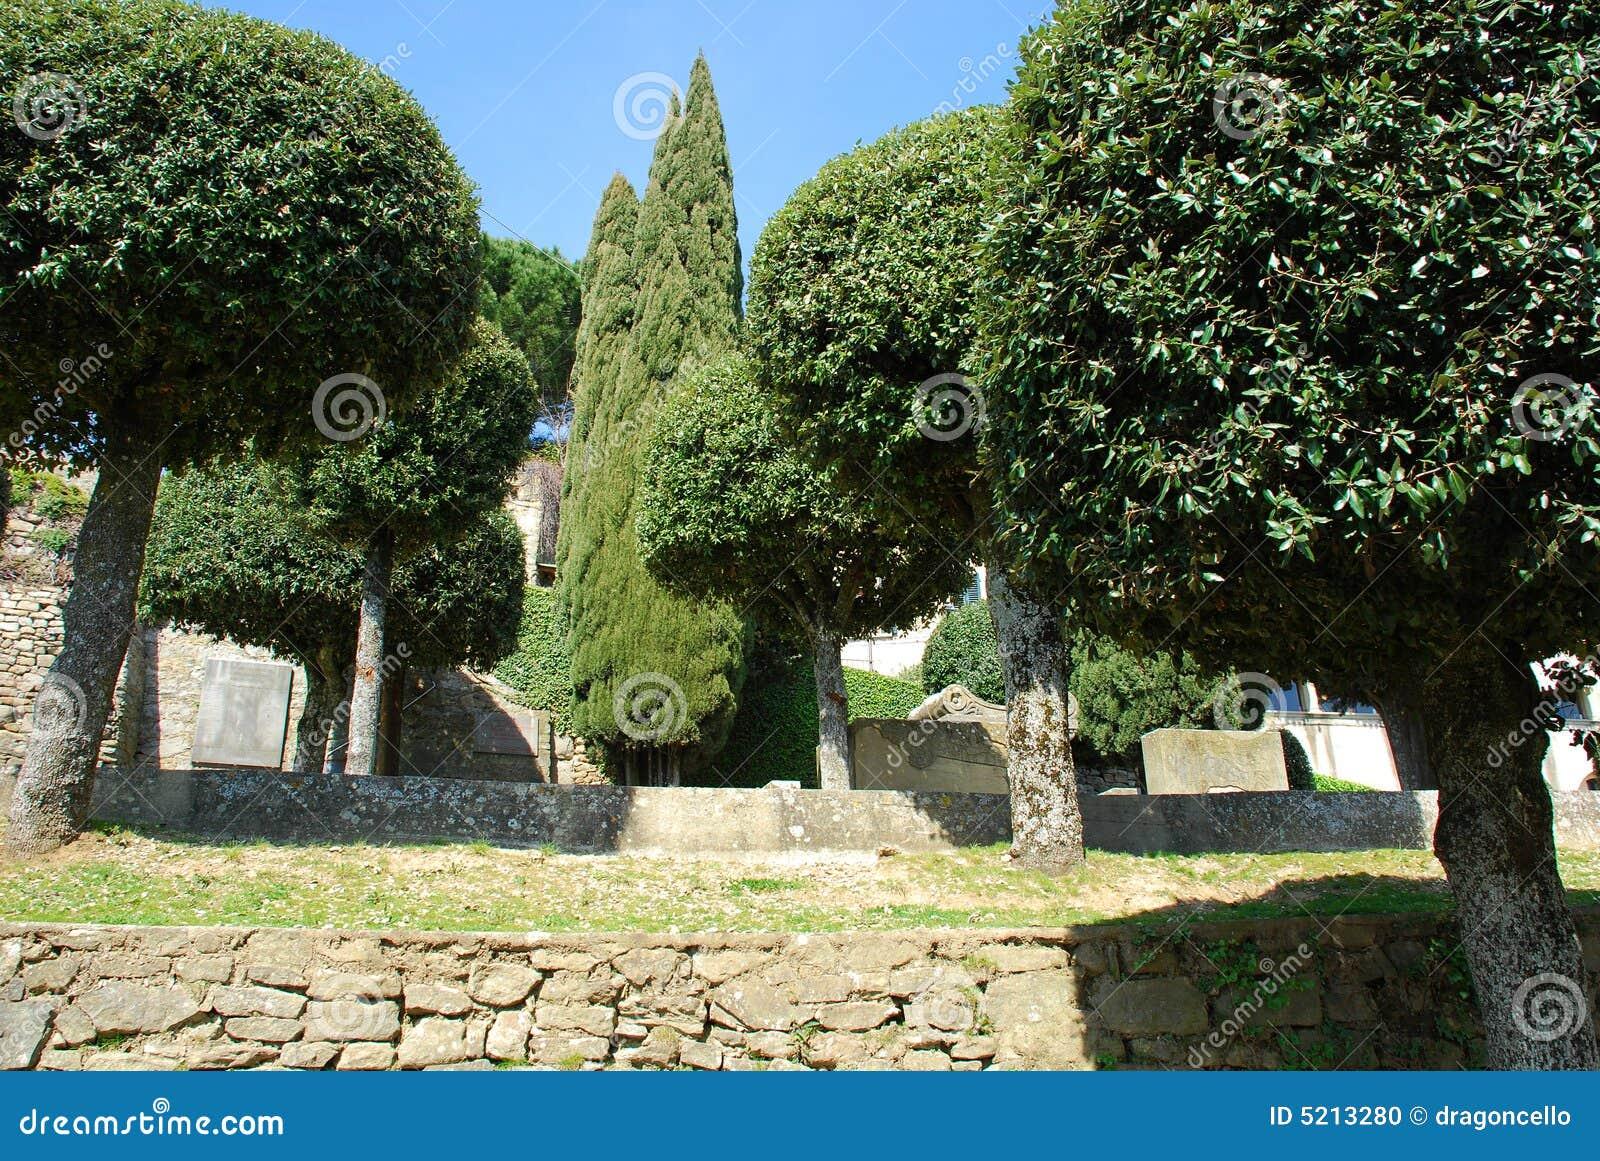 Giardini pubblici in Toscana 1